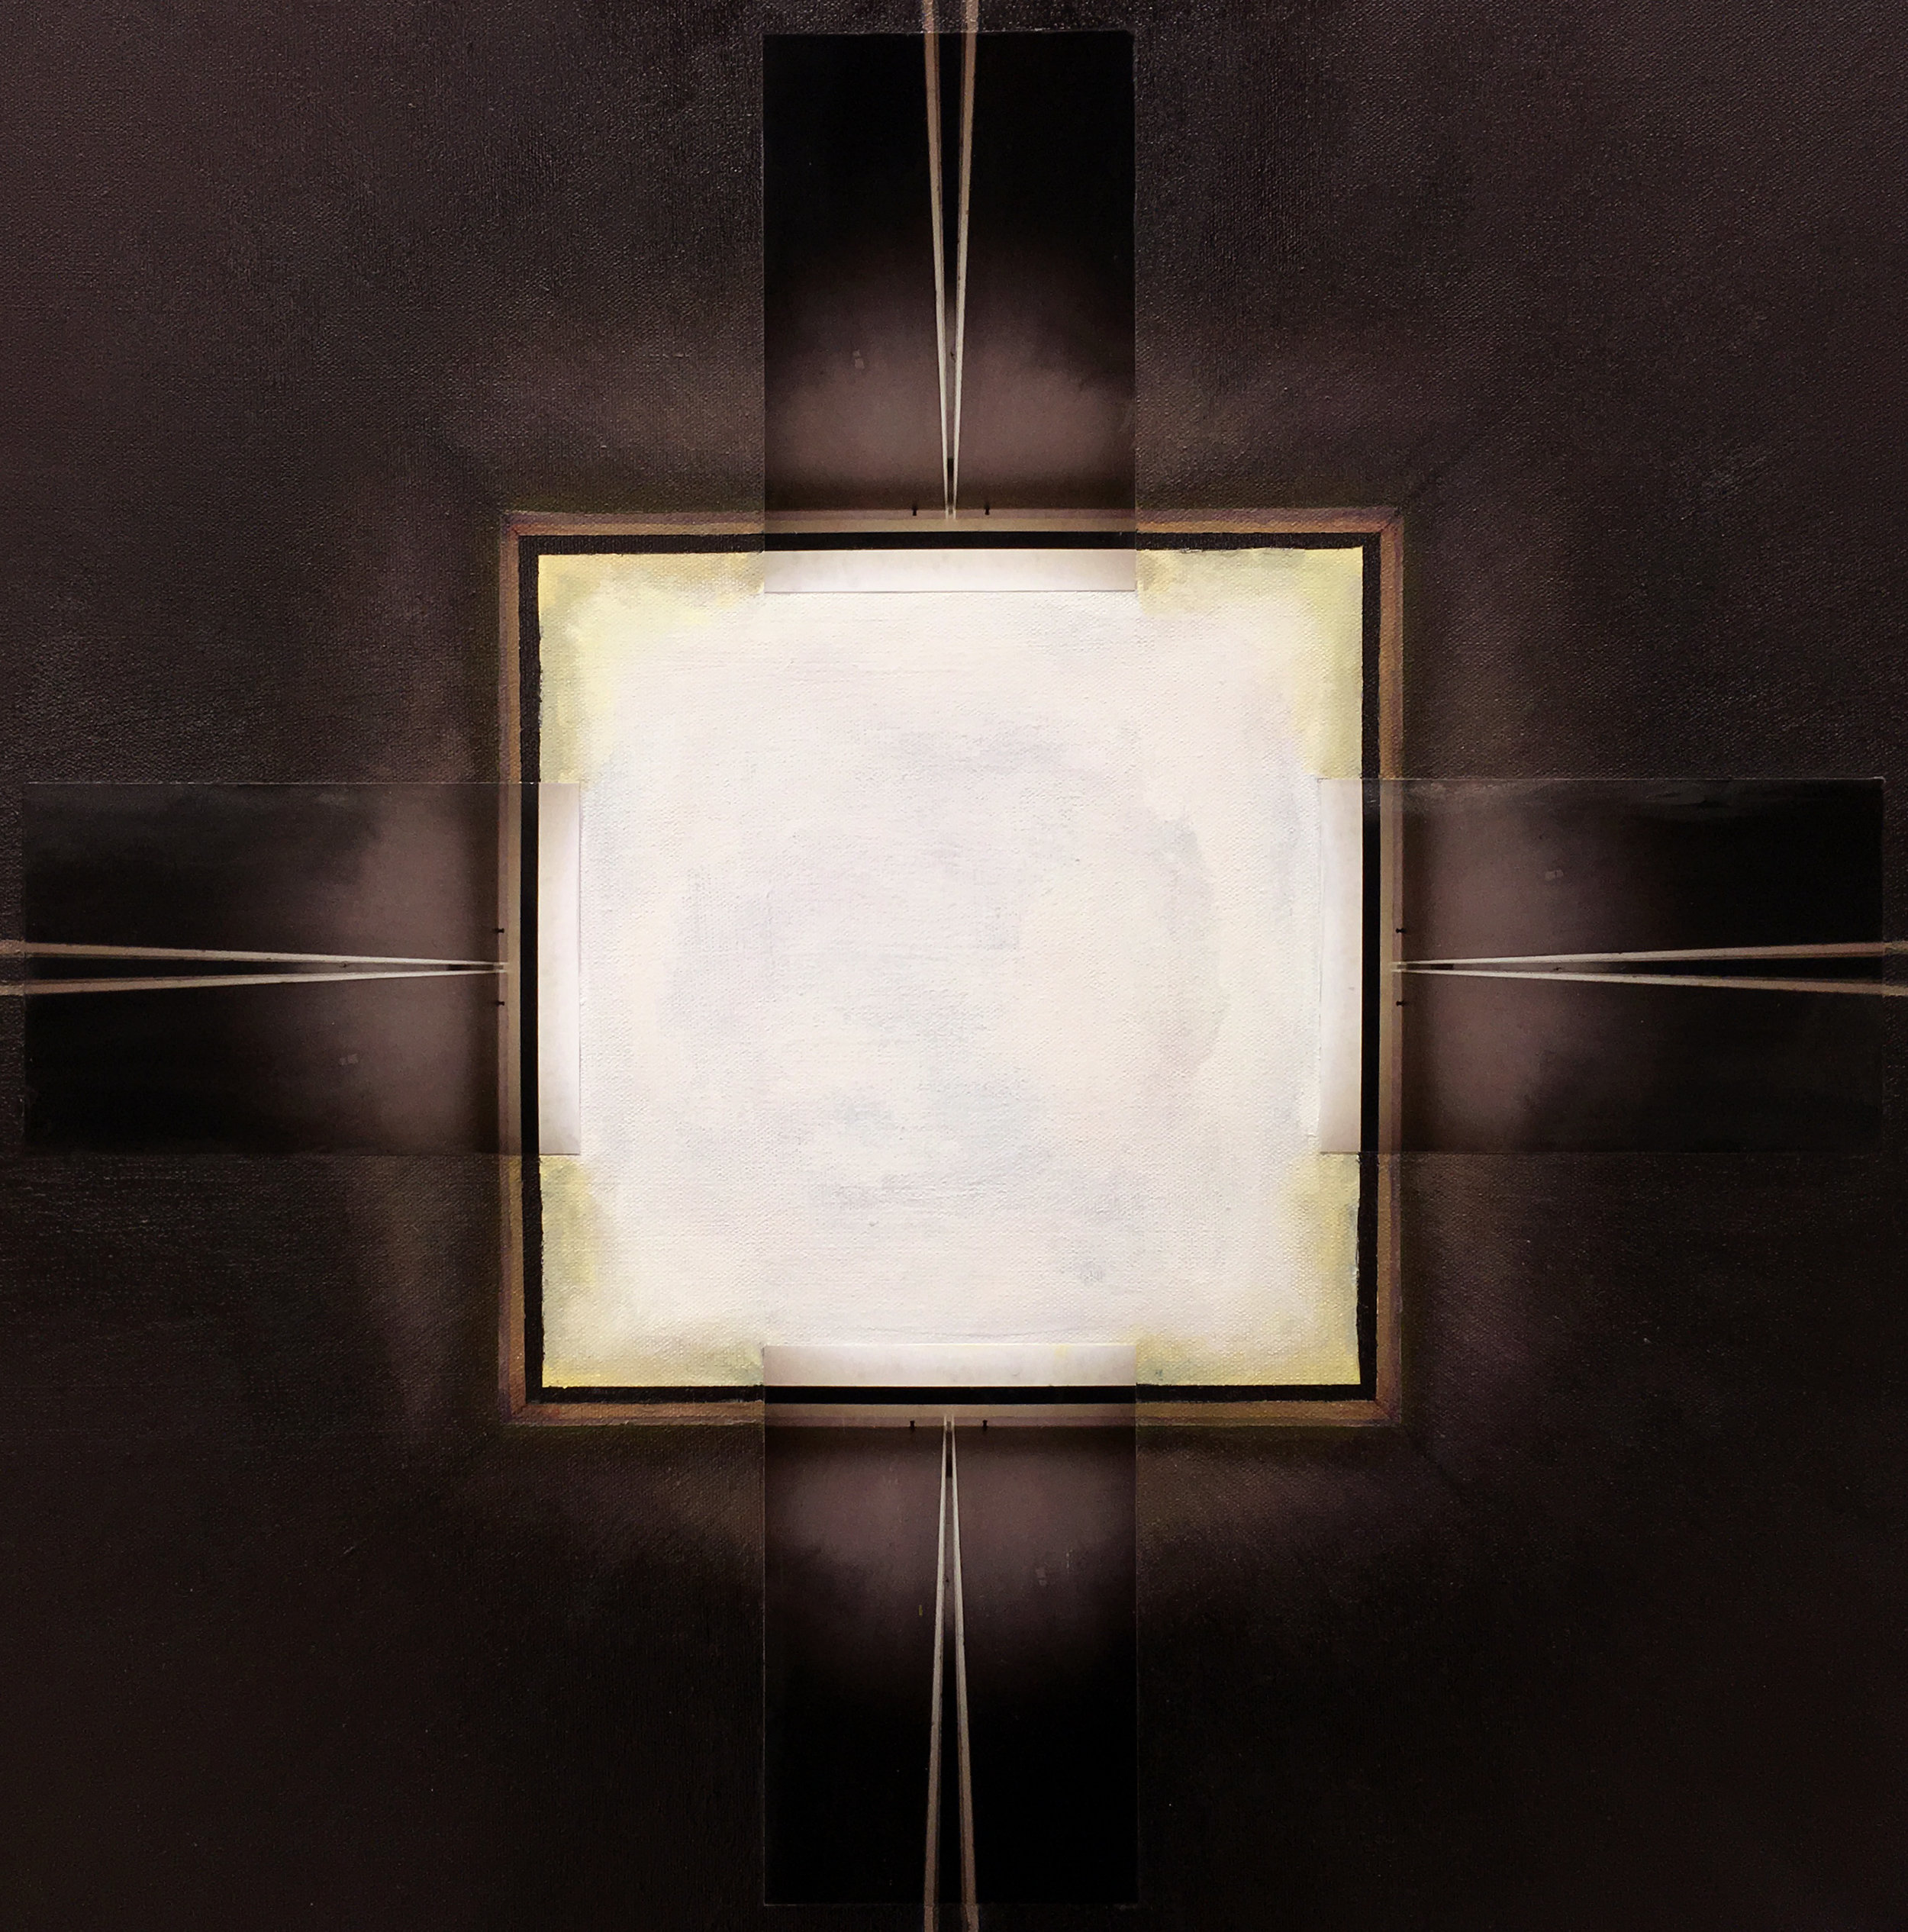 White Square (Detail)